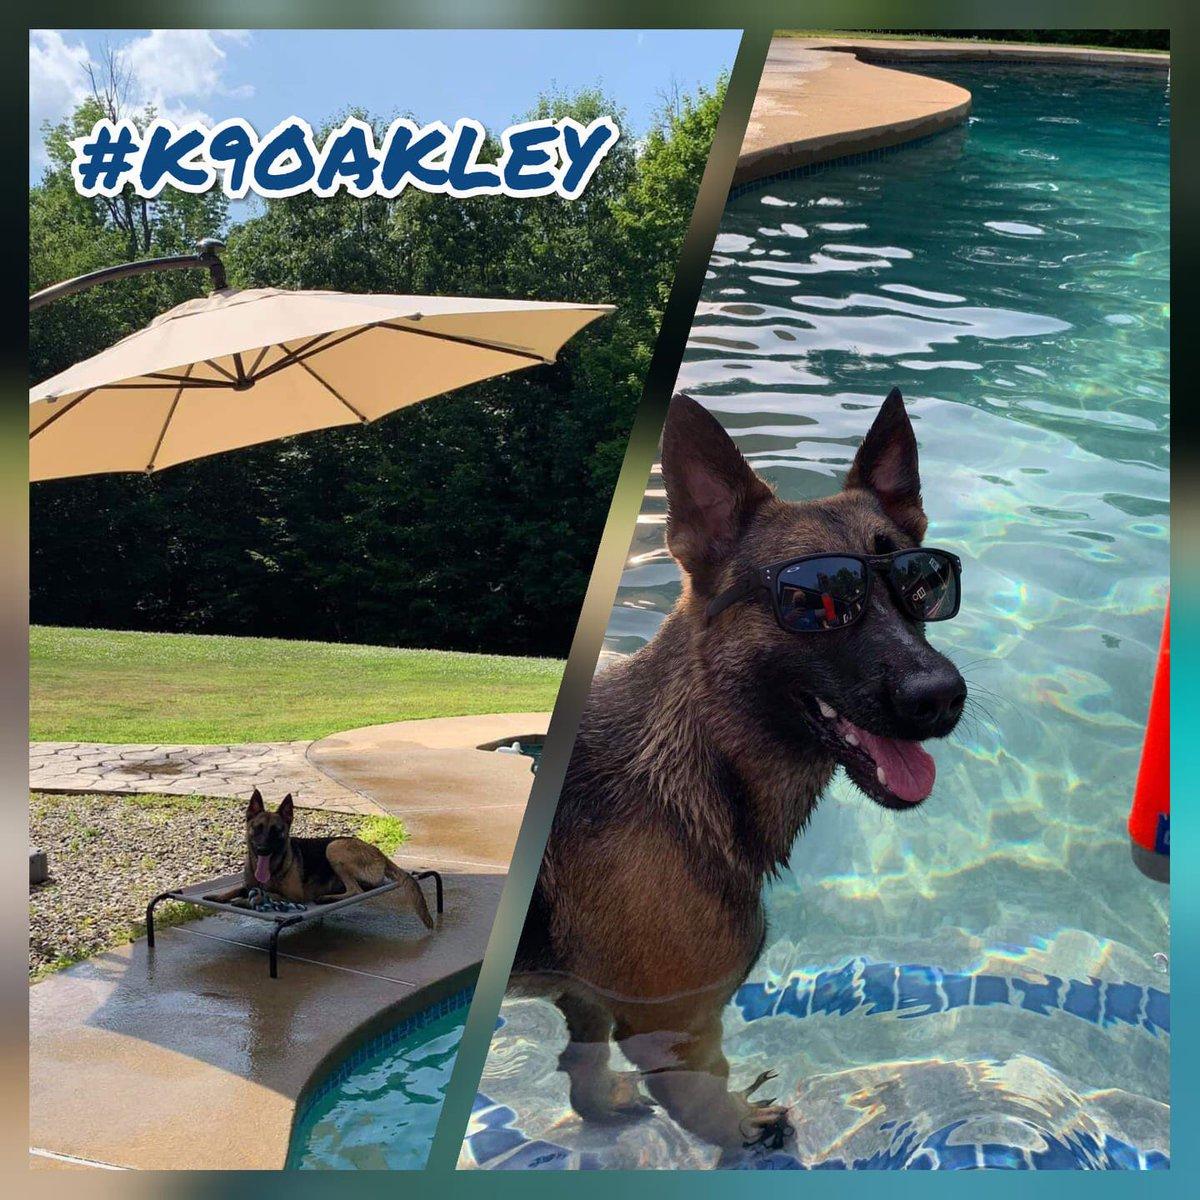 K-9 Oakley enjoying some water therapy to beat the heat!#k9oakley #nhdoc #watertherapypic.twitter.com/vvd99olliI